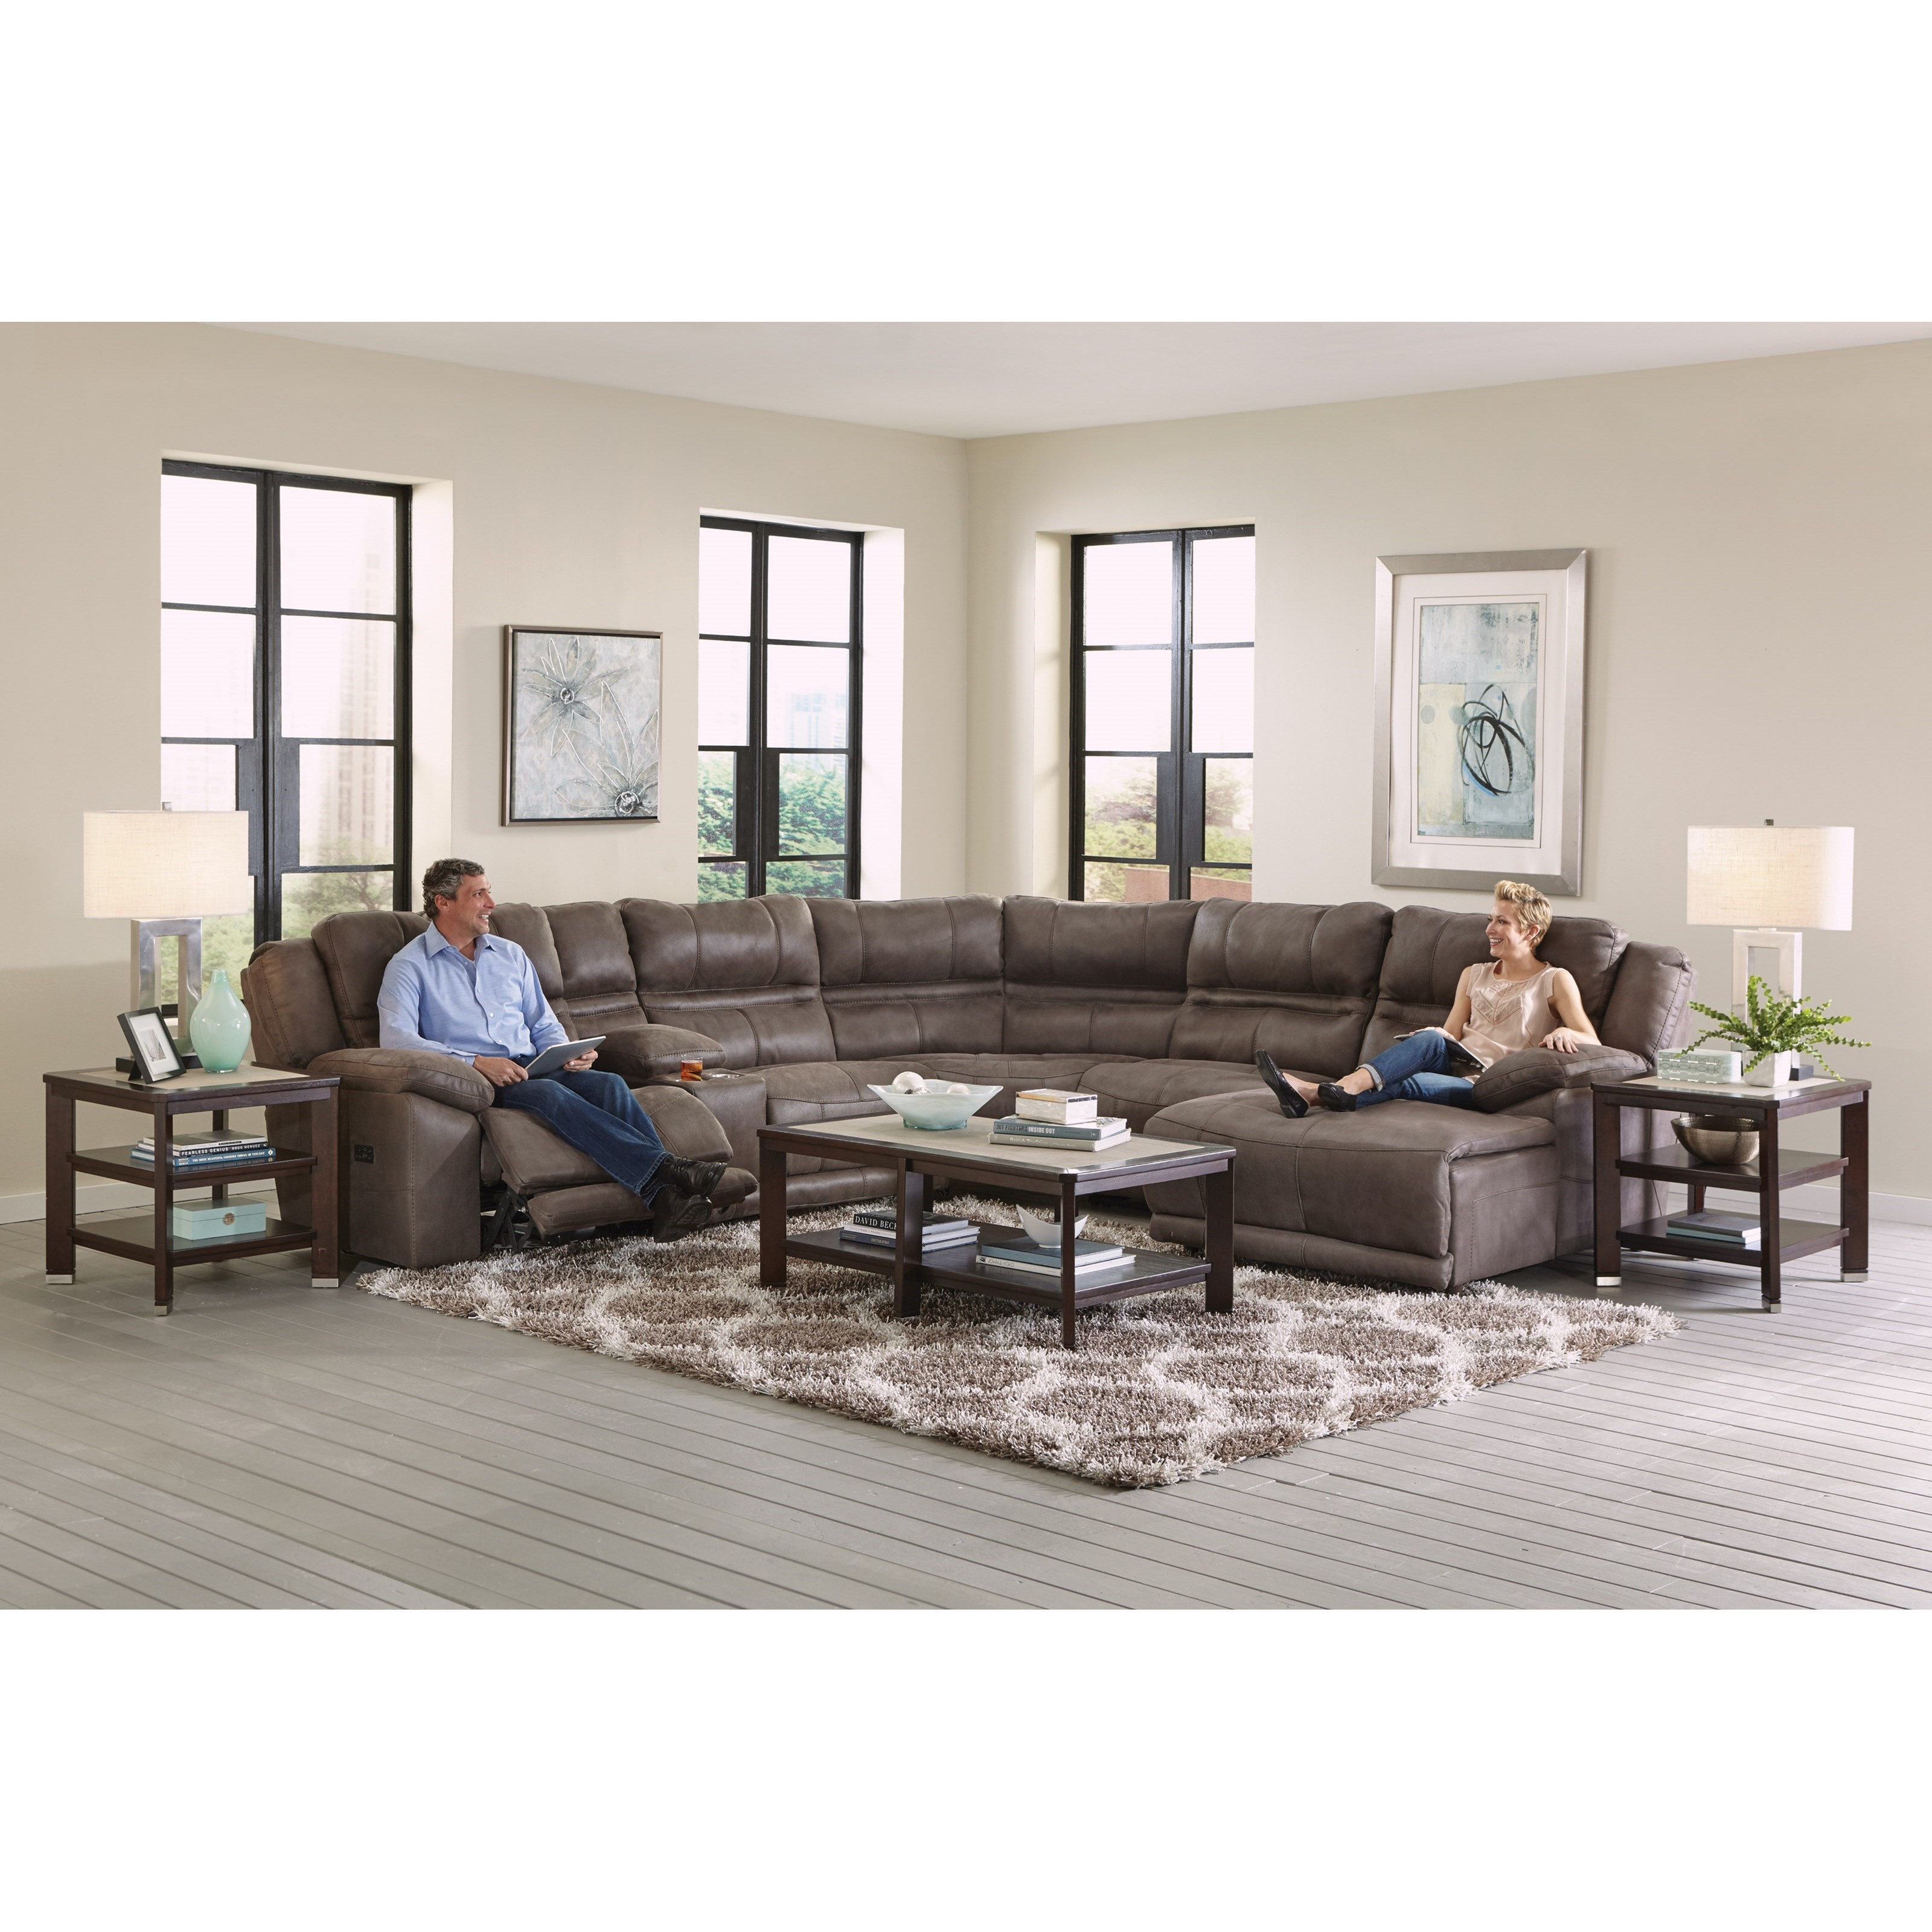 Catnapper Braxton Five Seat Reclining Sectional Sofa